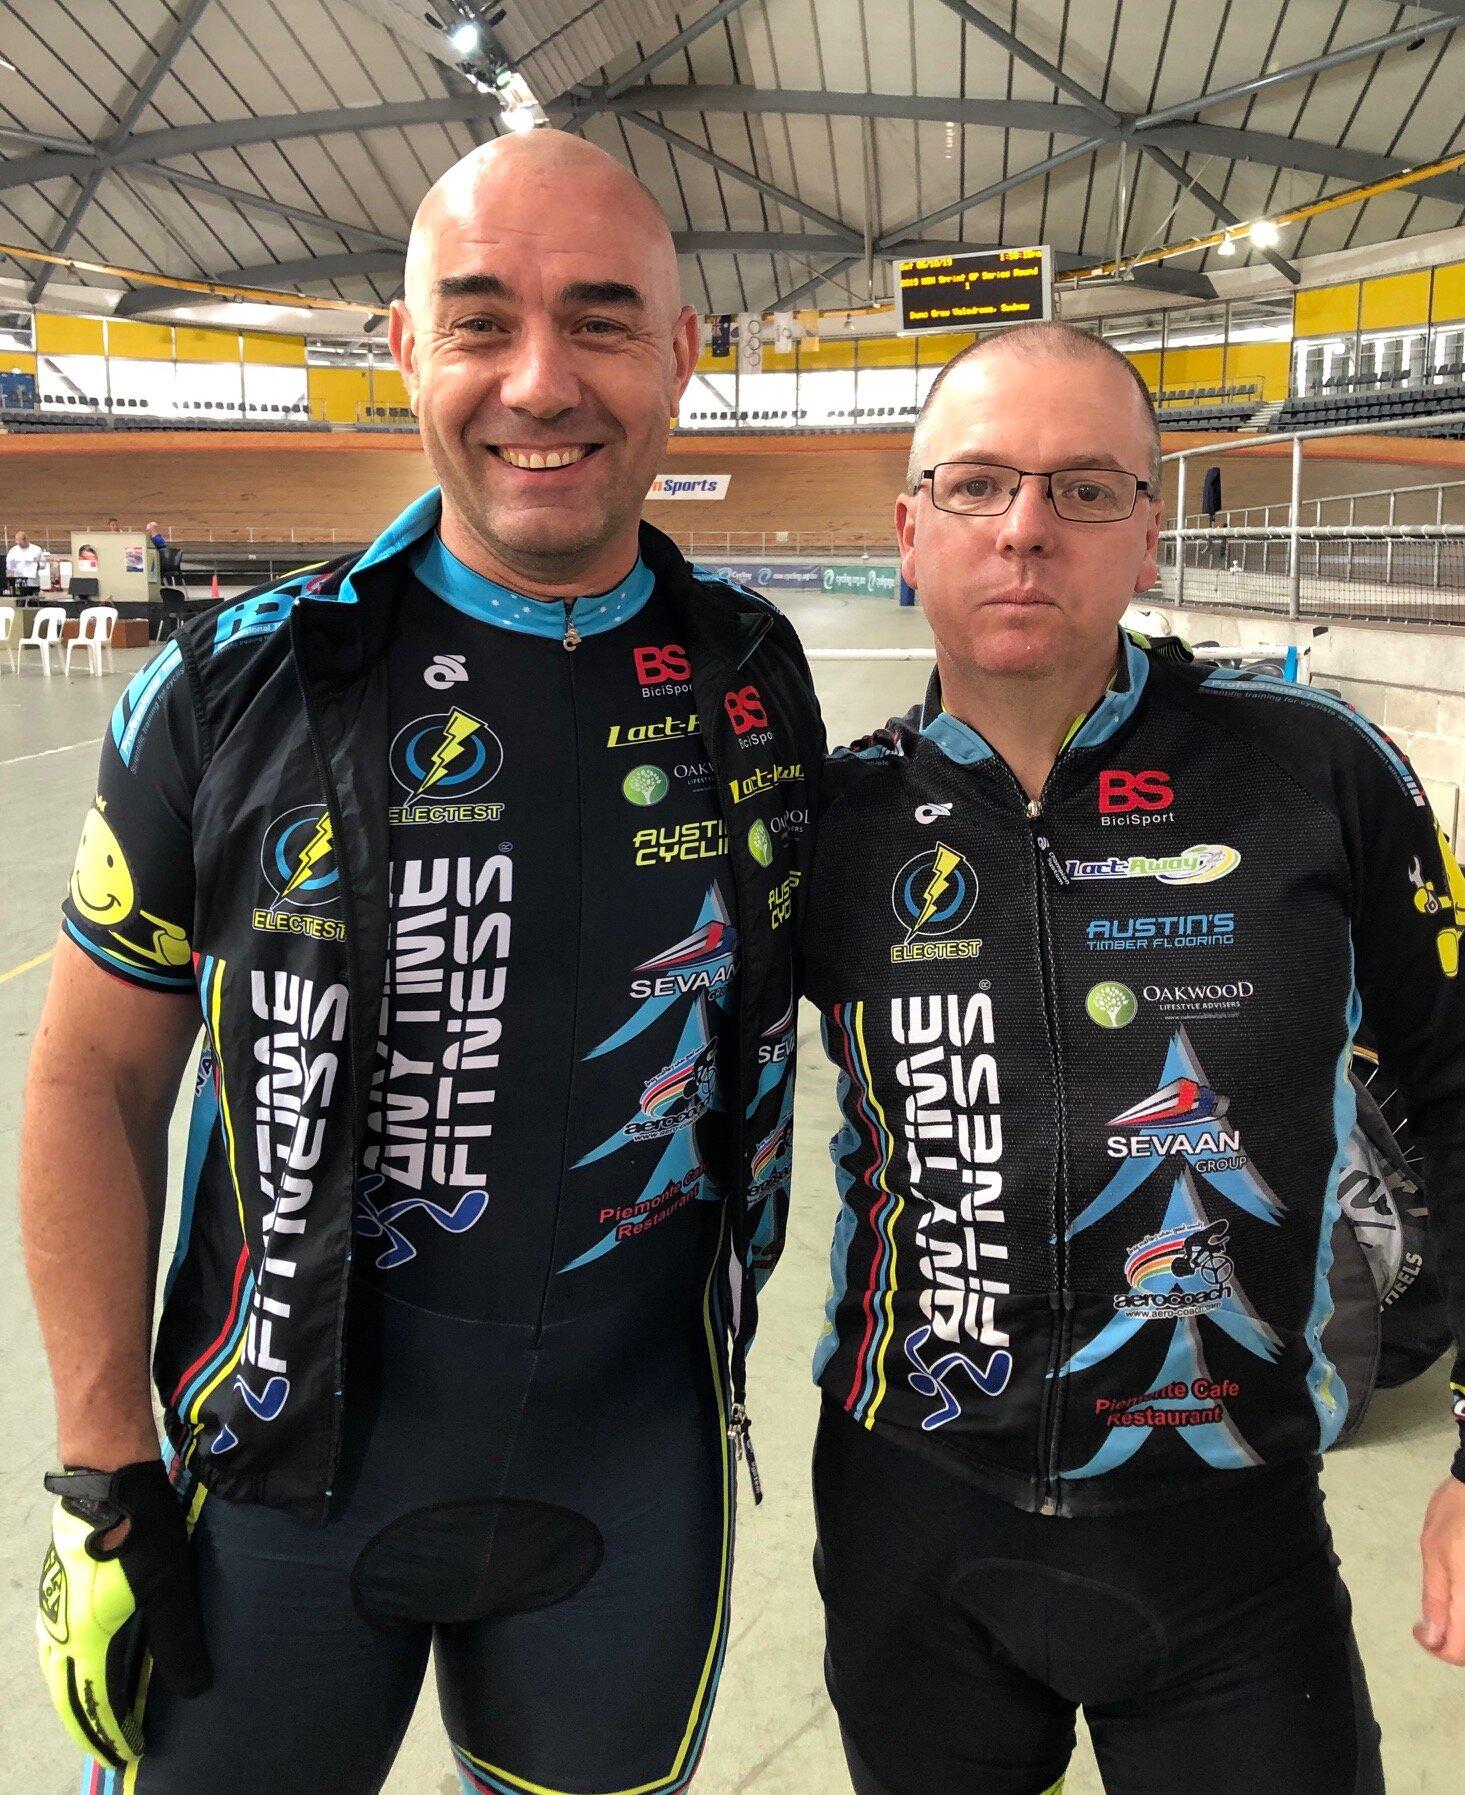 NSW GP 1 @ DGV @ 5 Sept - Damien Bottero & Davide van der Browne